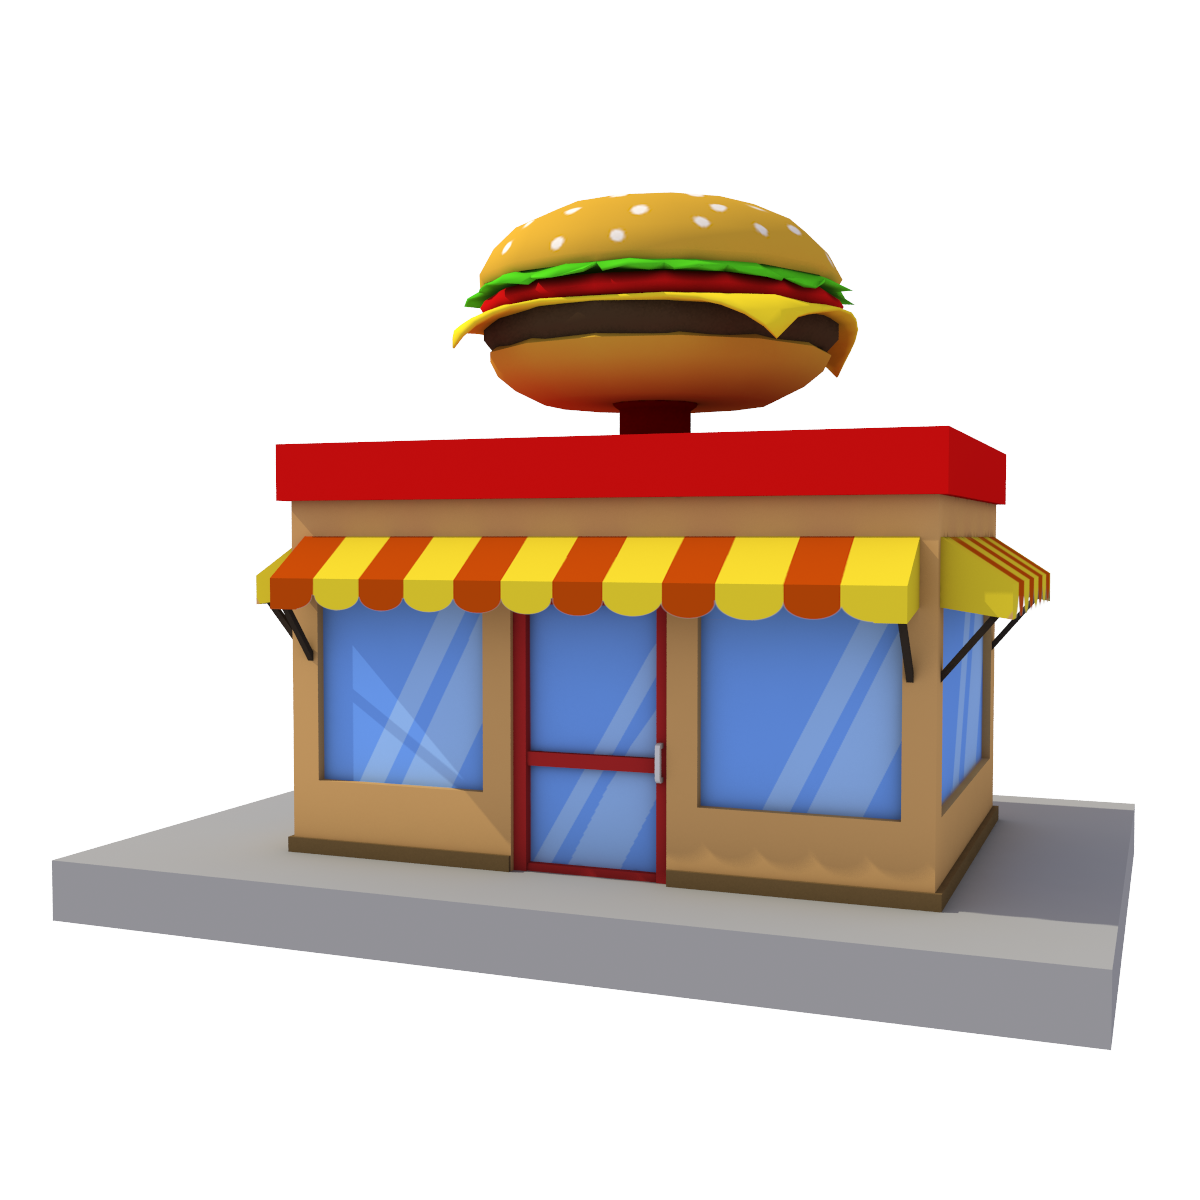 svg Buildings clipart burger. Building cartoon house low